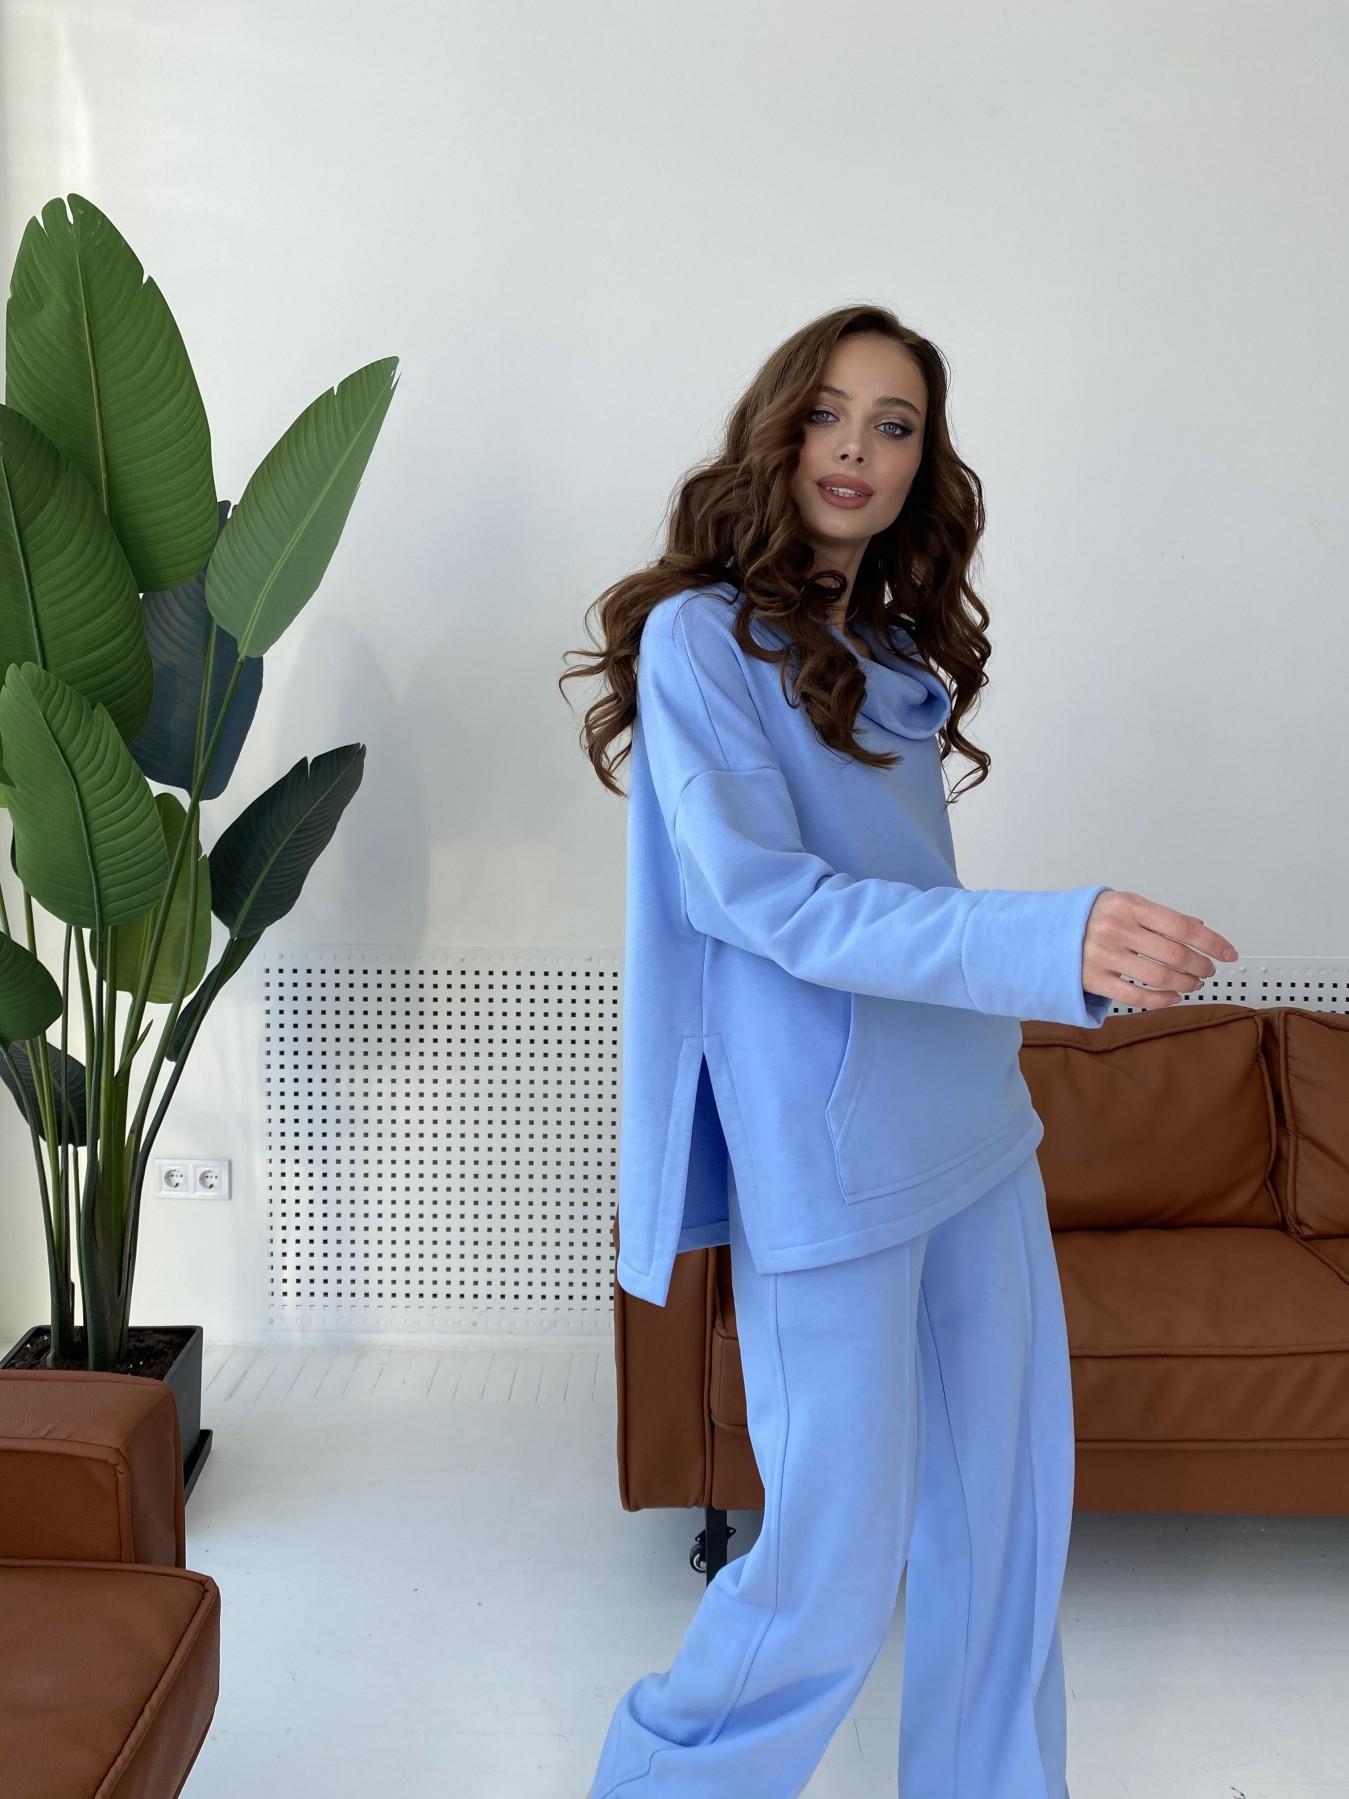 Кристиан костюм 3х нитка 10676 АРТ. 47246 Цвет: Голубой - фото 3, интернет магазин tm-modus.ru